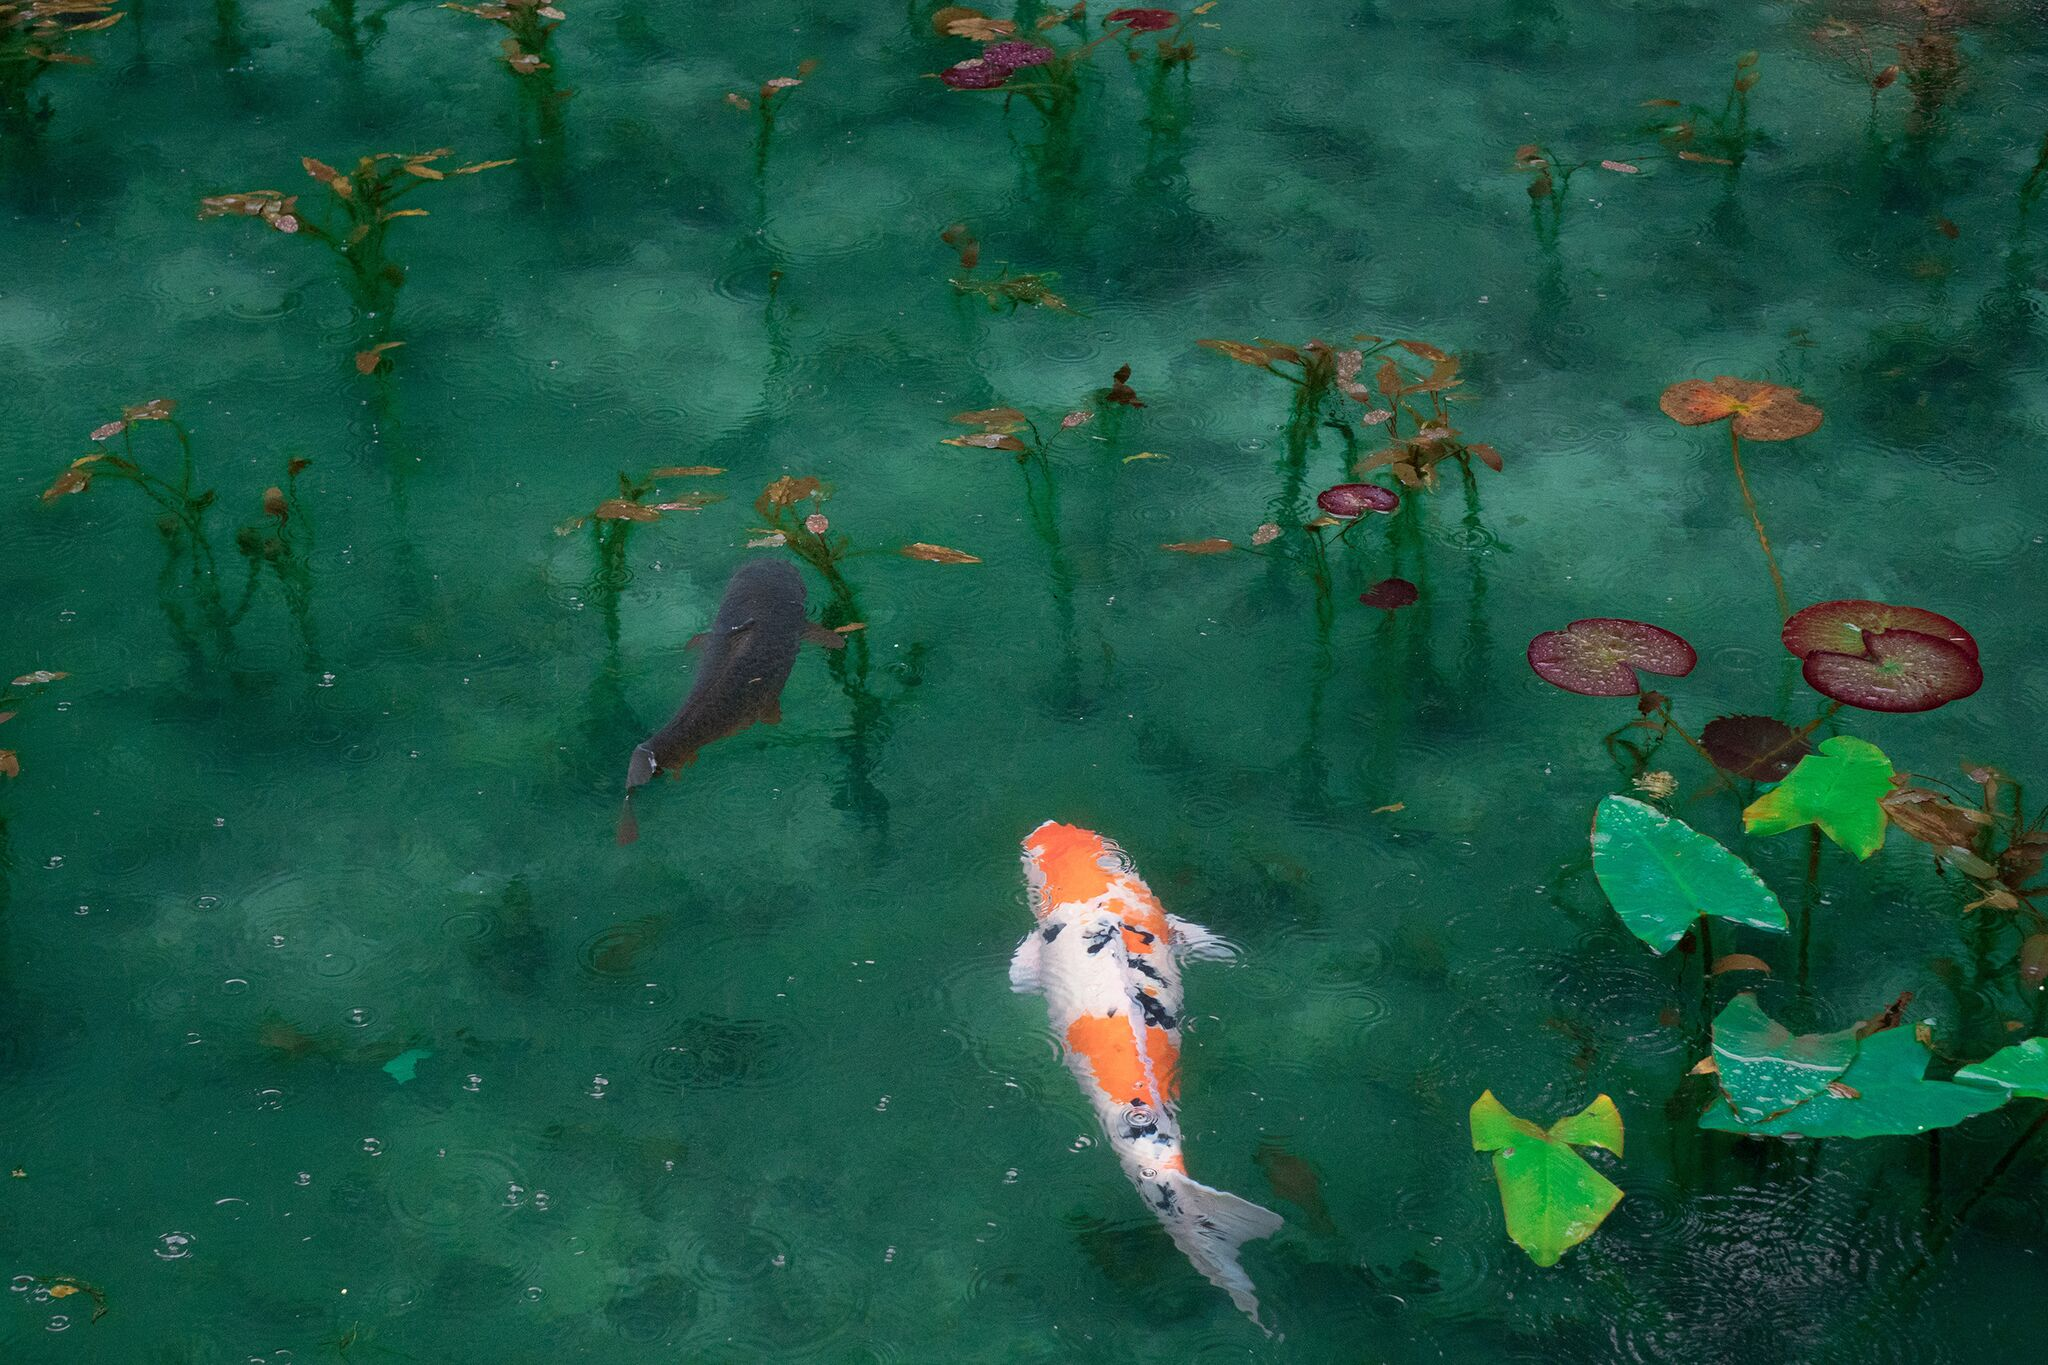 Anime 2048x1365 artwork fish animals plants water koi pond